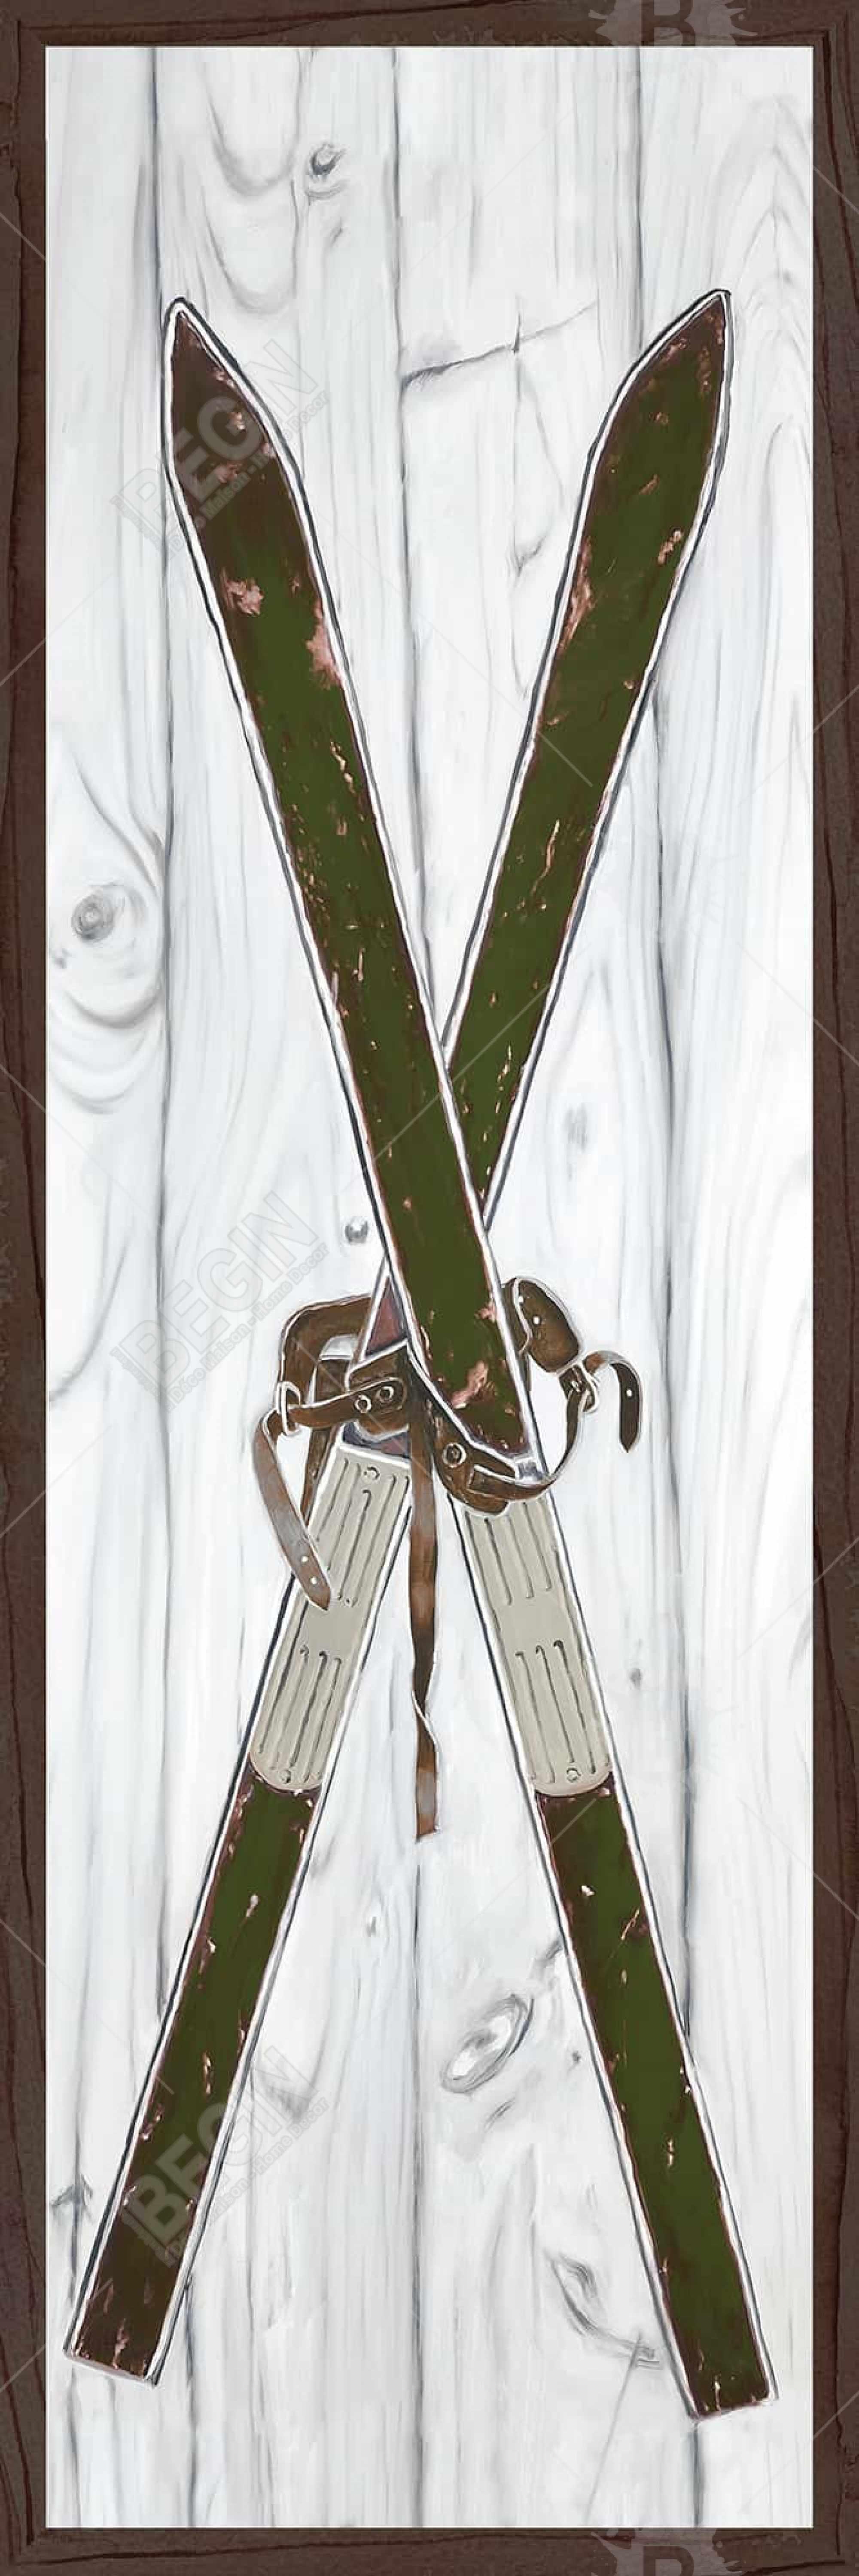 Green vintage skis